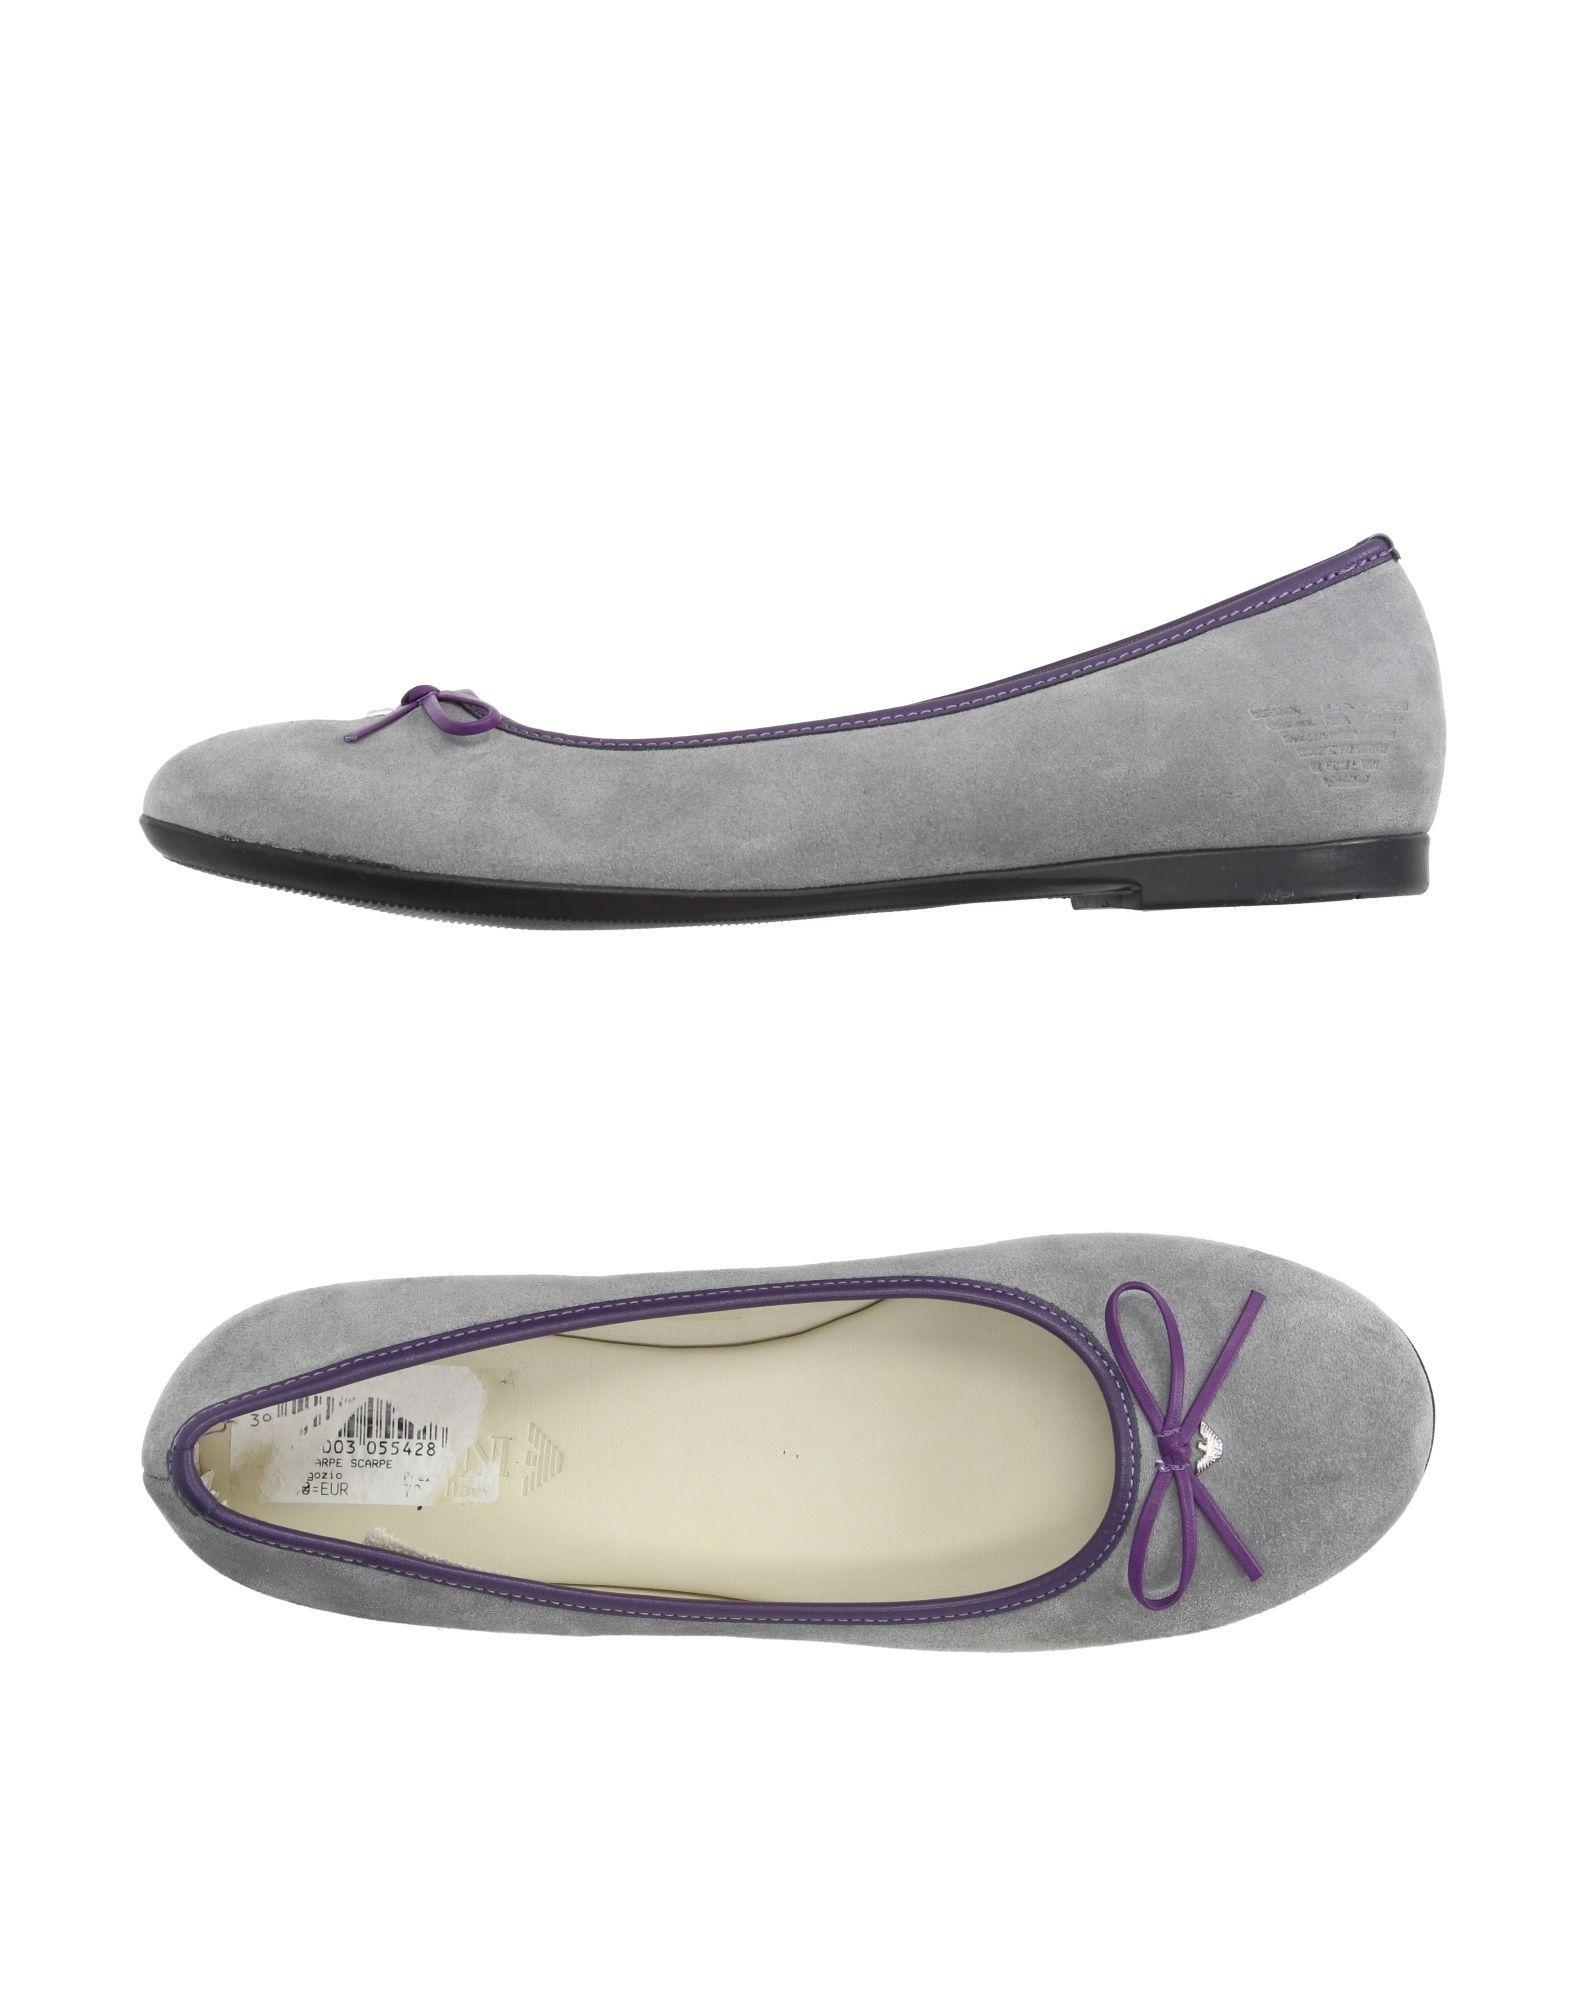 FOOTWEAR Armani Junior Grey Girl Leather